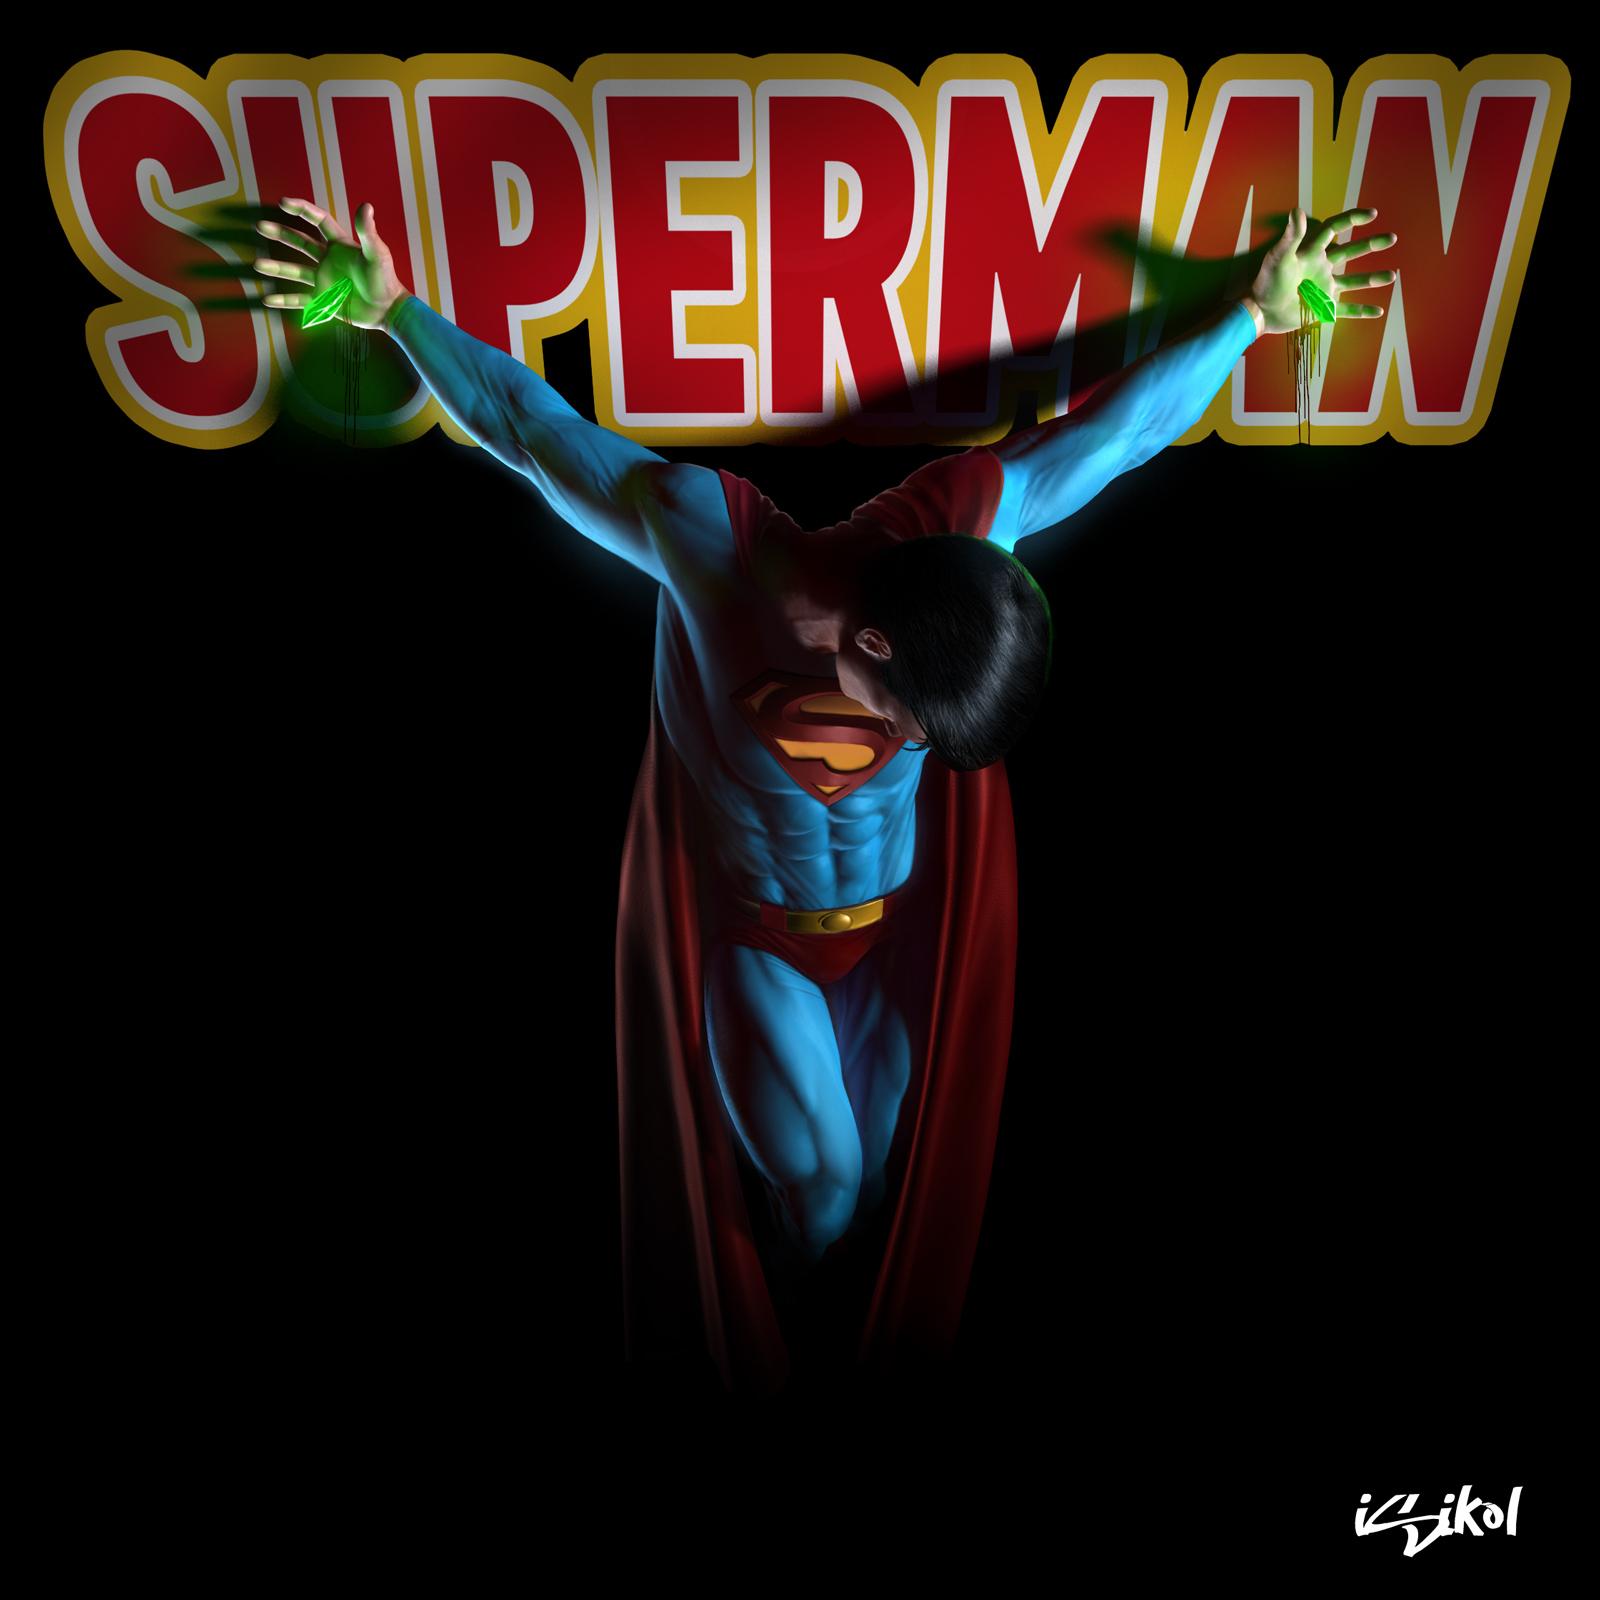 SUPERMAN CRUCIFIXION